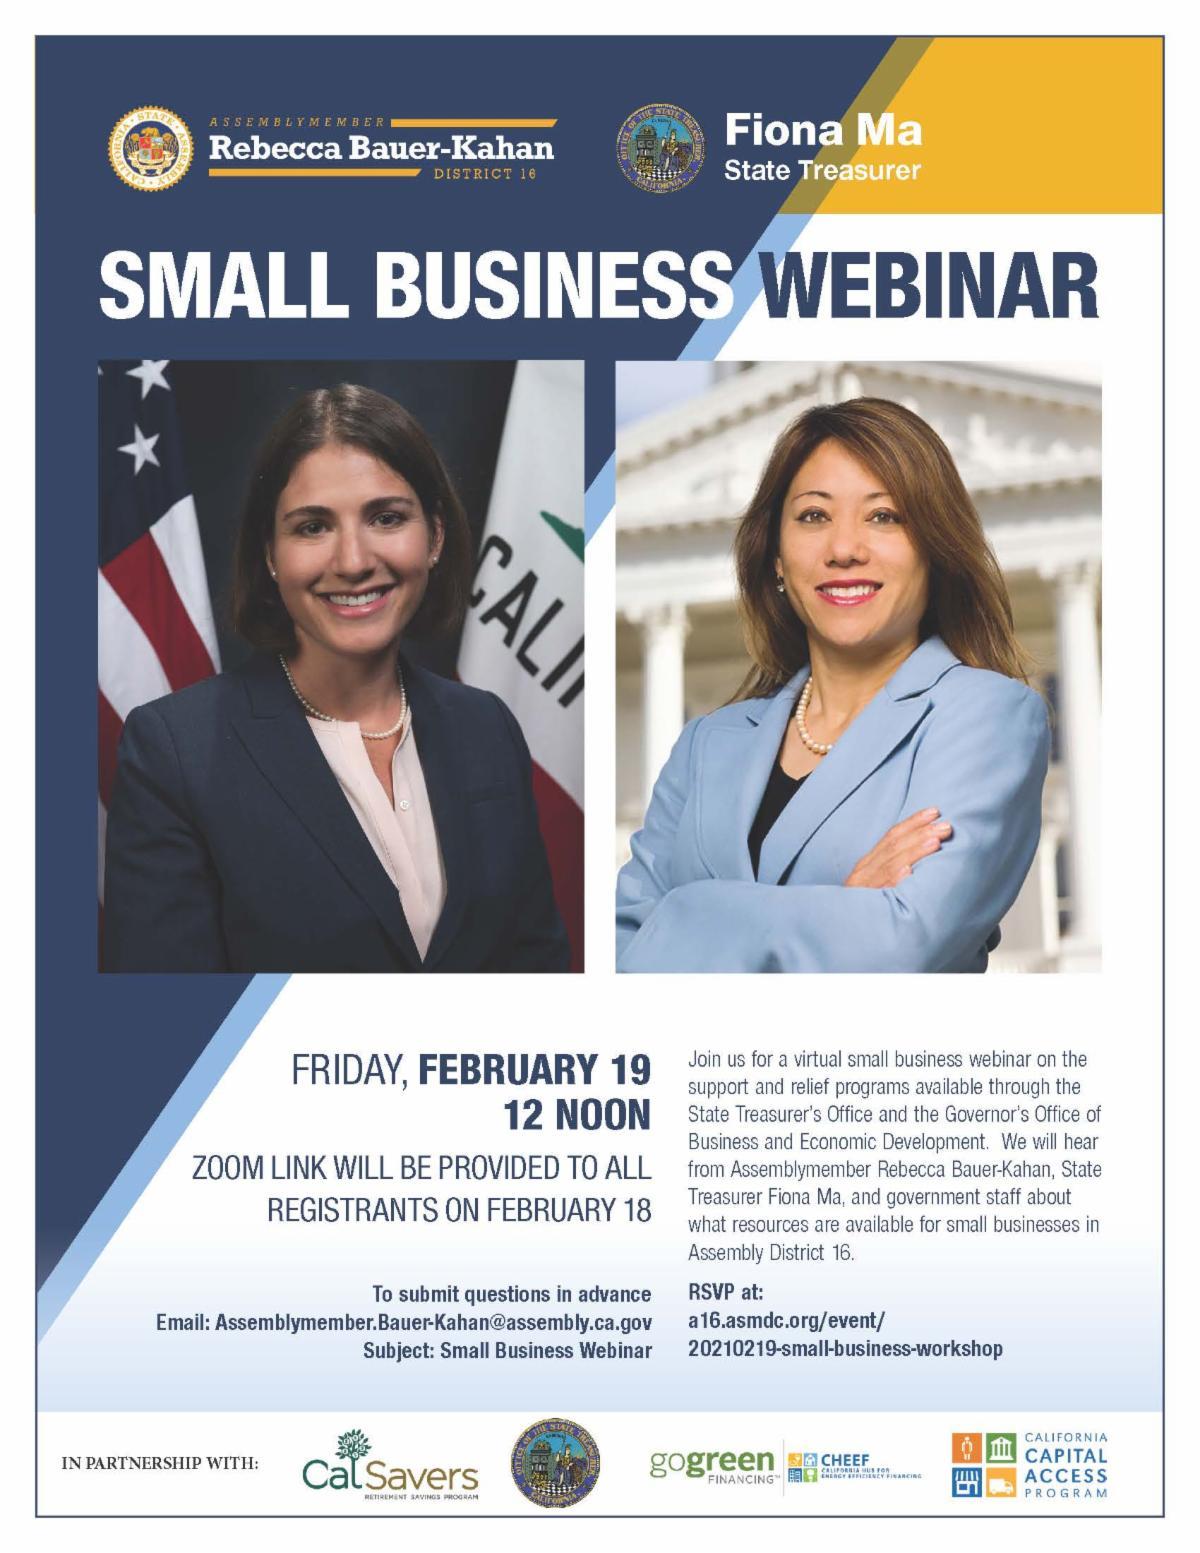 Small Business Webinar